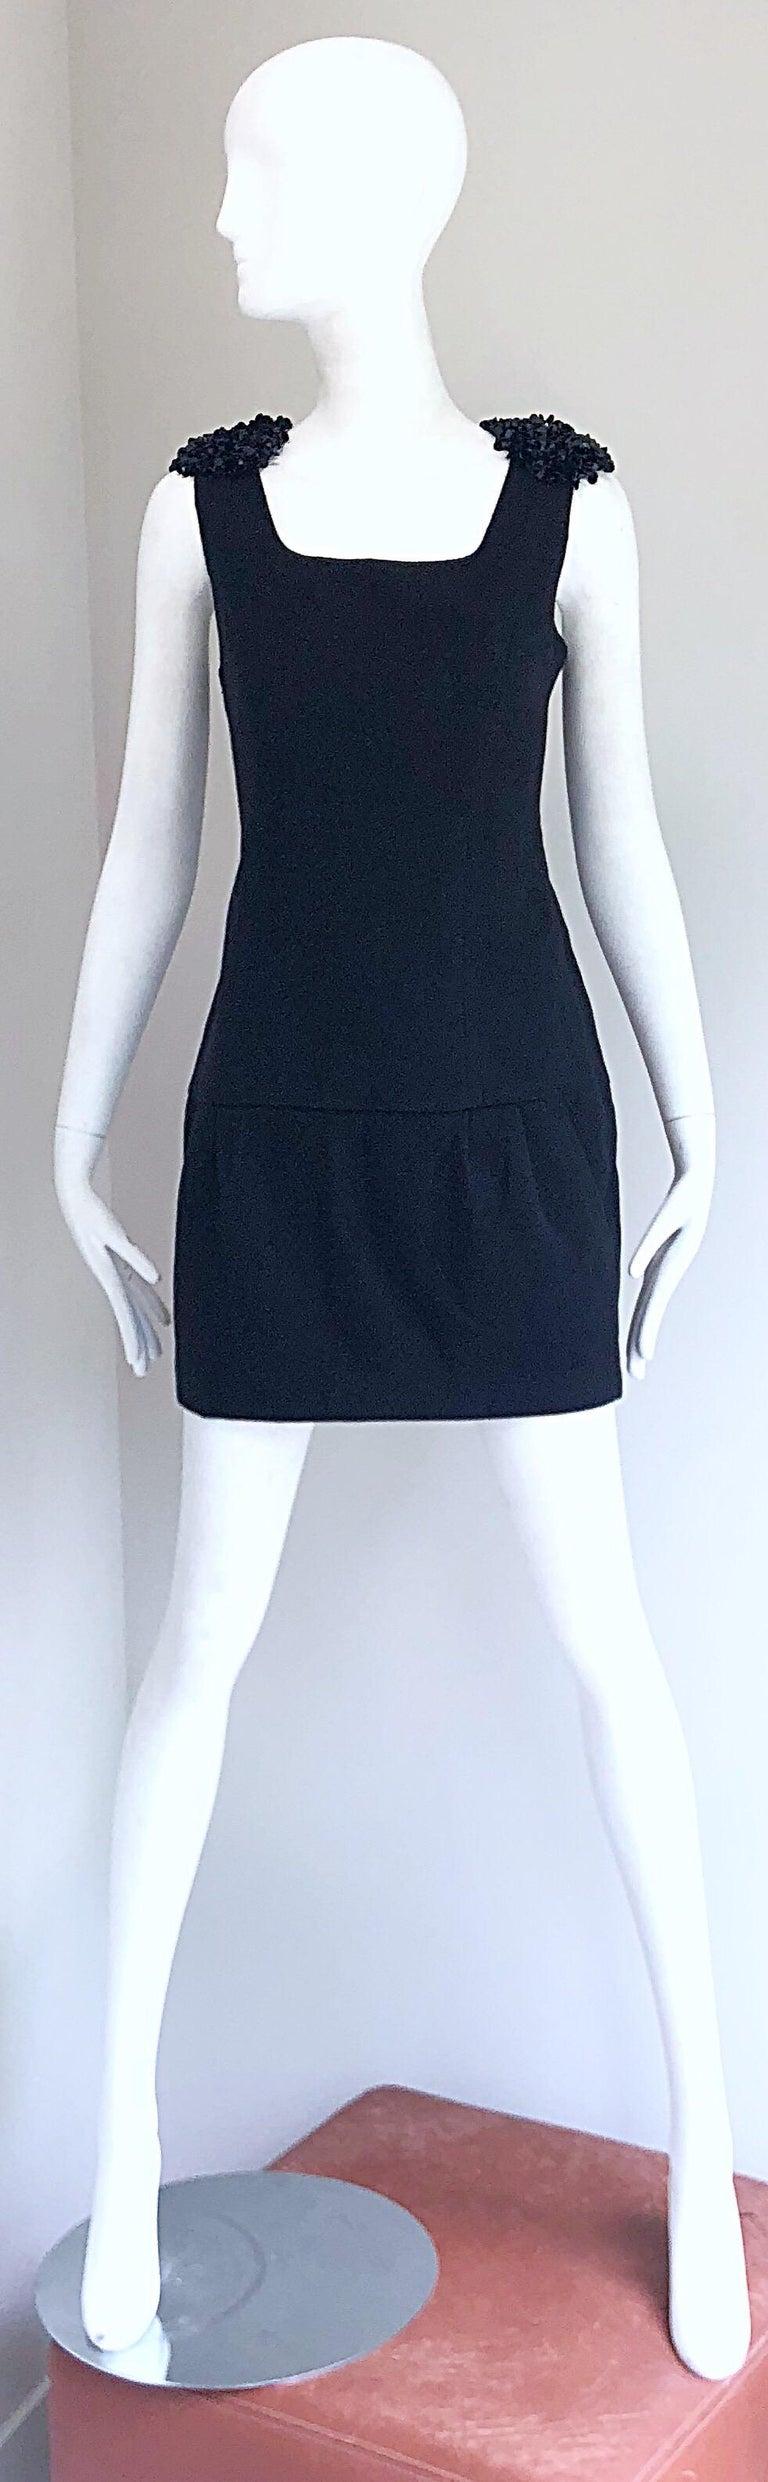 1990s Miu Miu Black Virgin Wool Sequin Beaded Vintage 90s Mini Dress For Sale 10